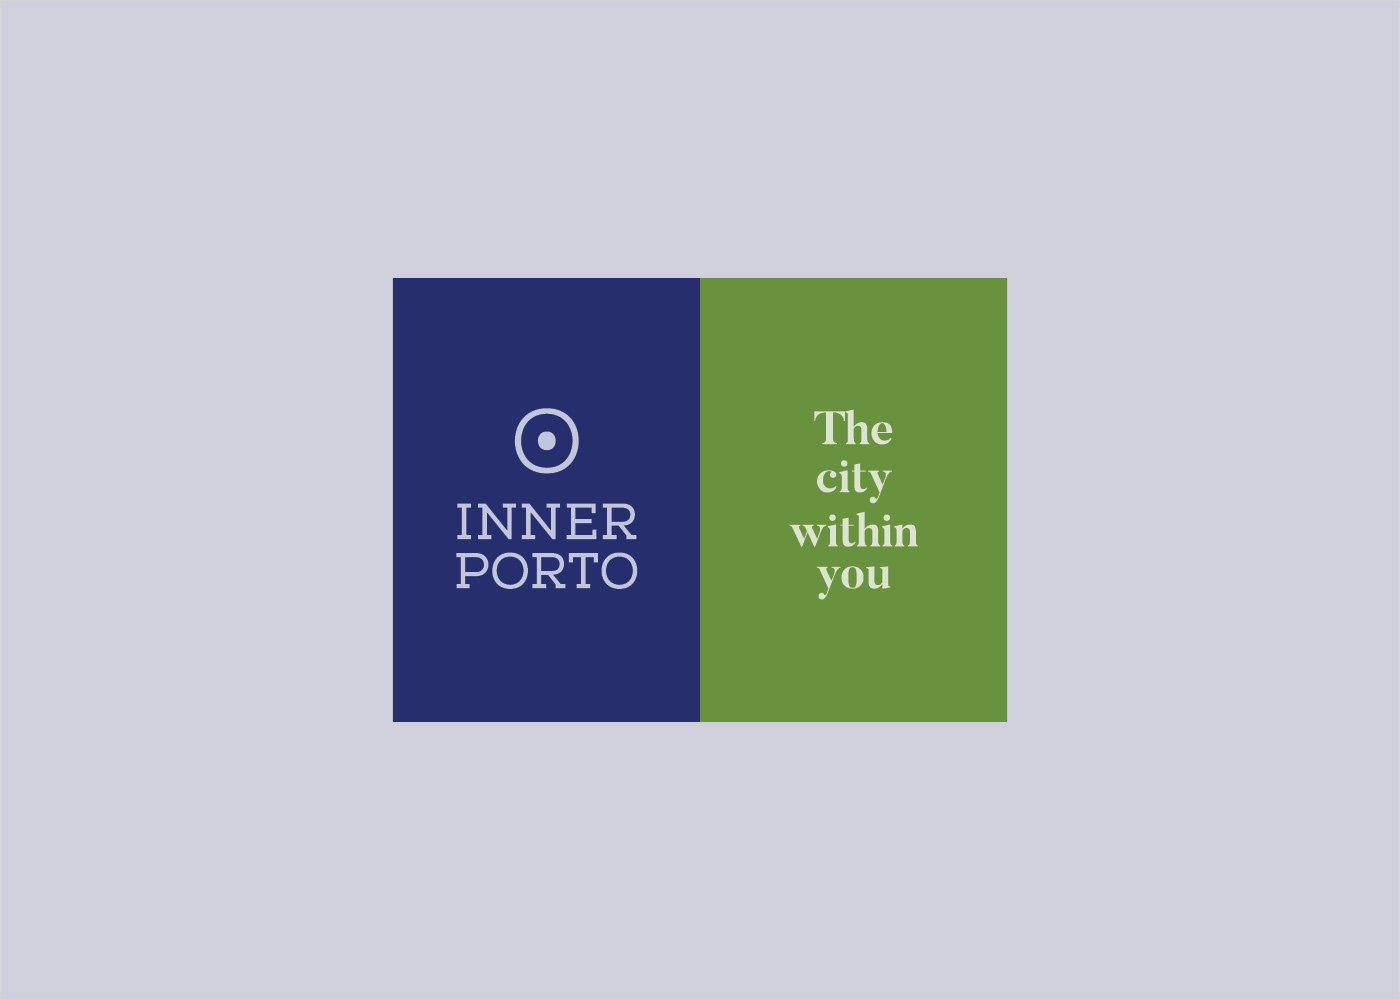 porto real-estate identity slogan